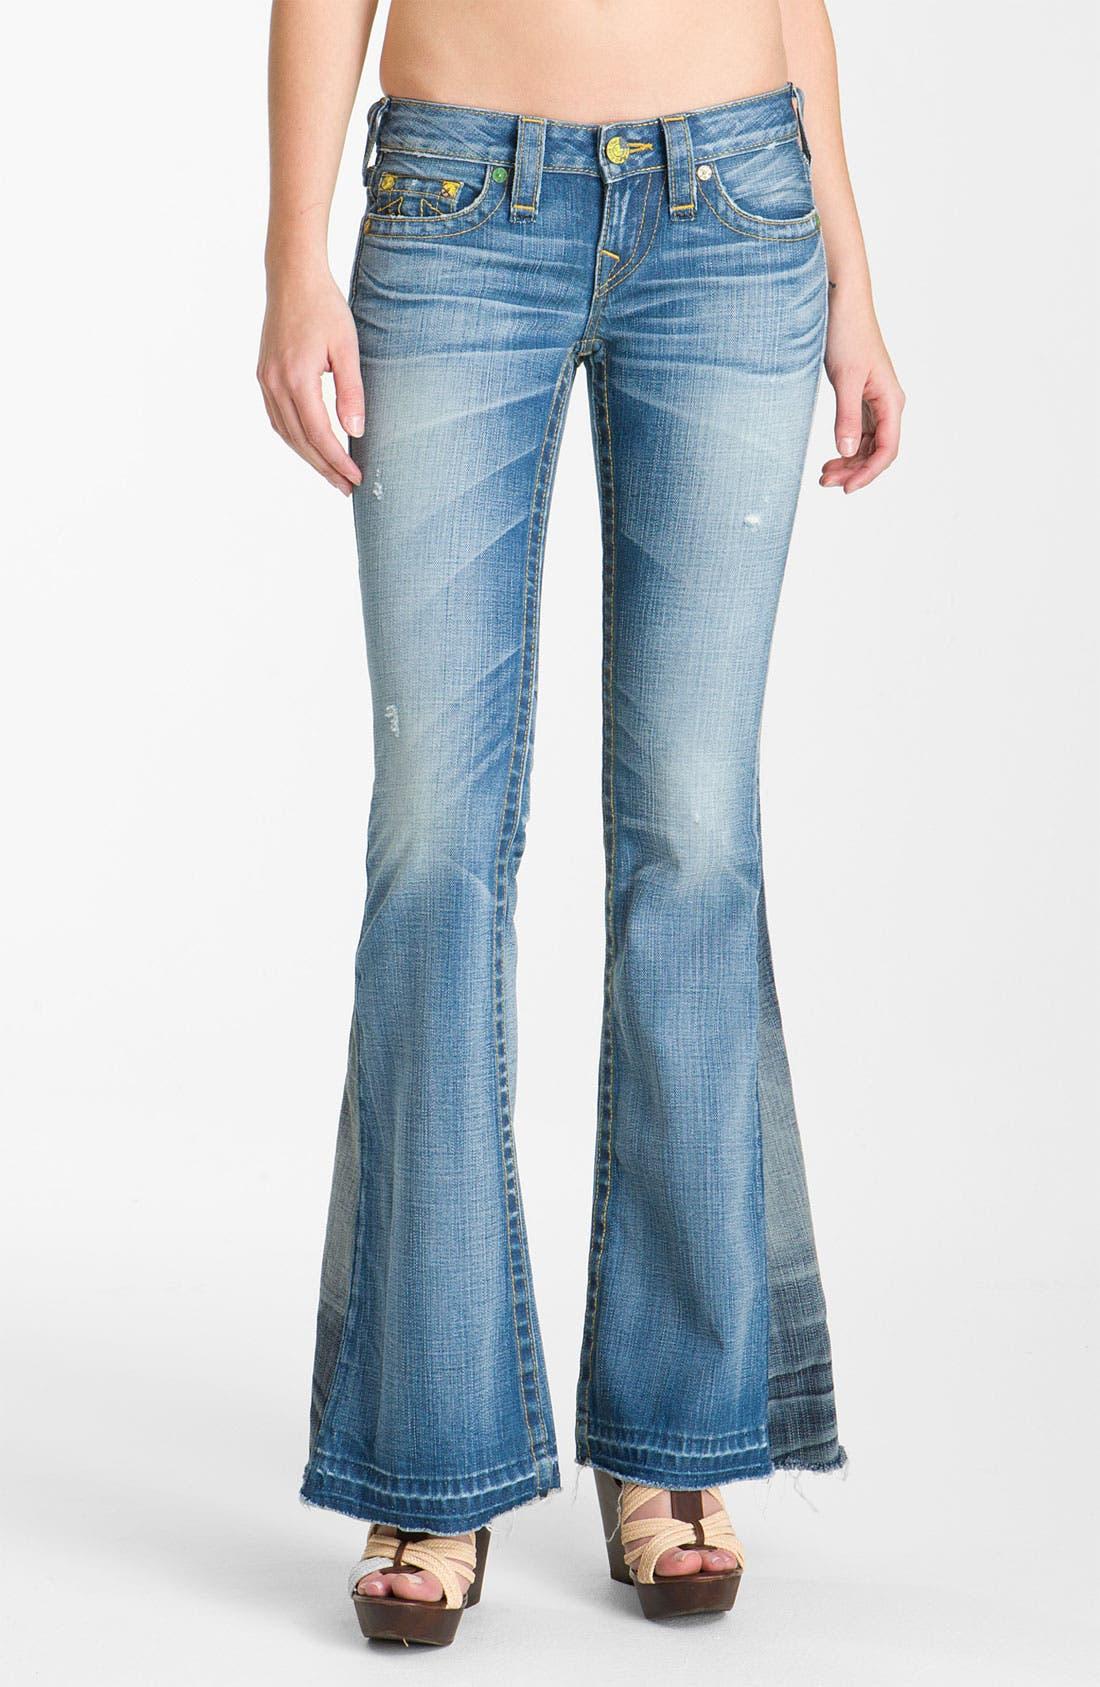 Main Image - True Religion Brand Jeans 'Bobby' Flare Leg Jeans (Arlington)